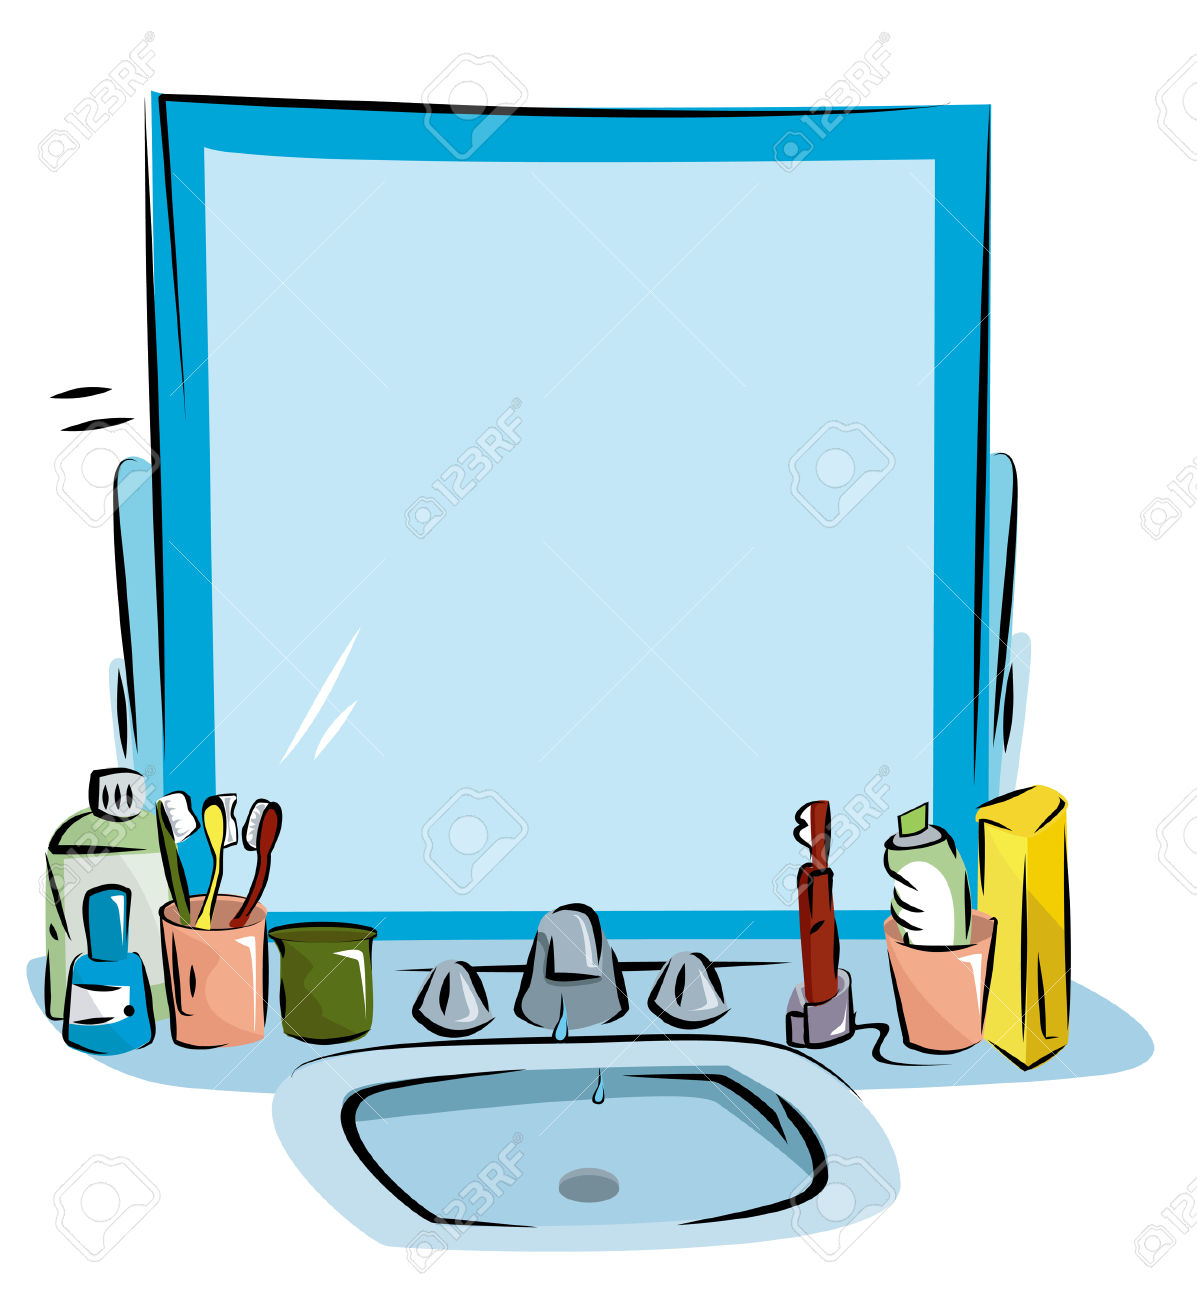 Mirror bathroom sink pencil. Bath clipart cartoon